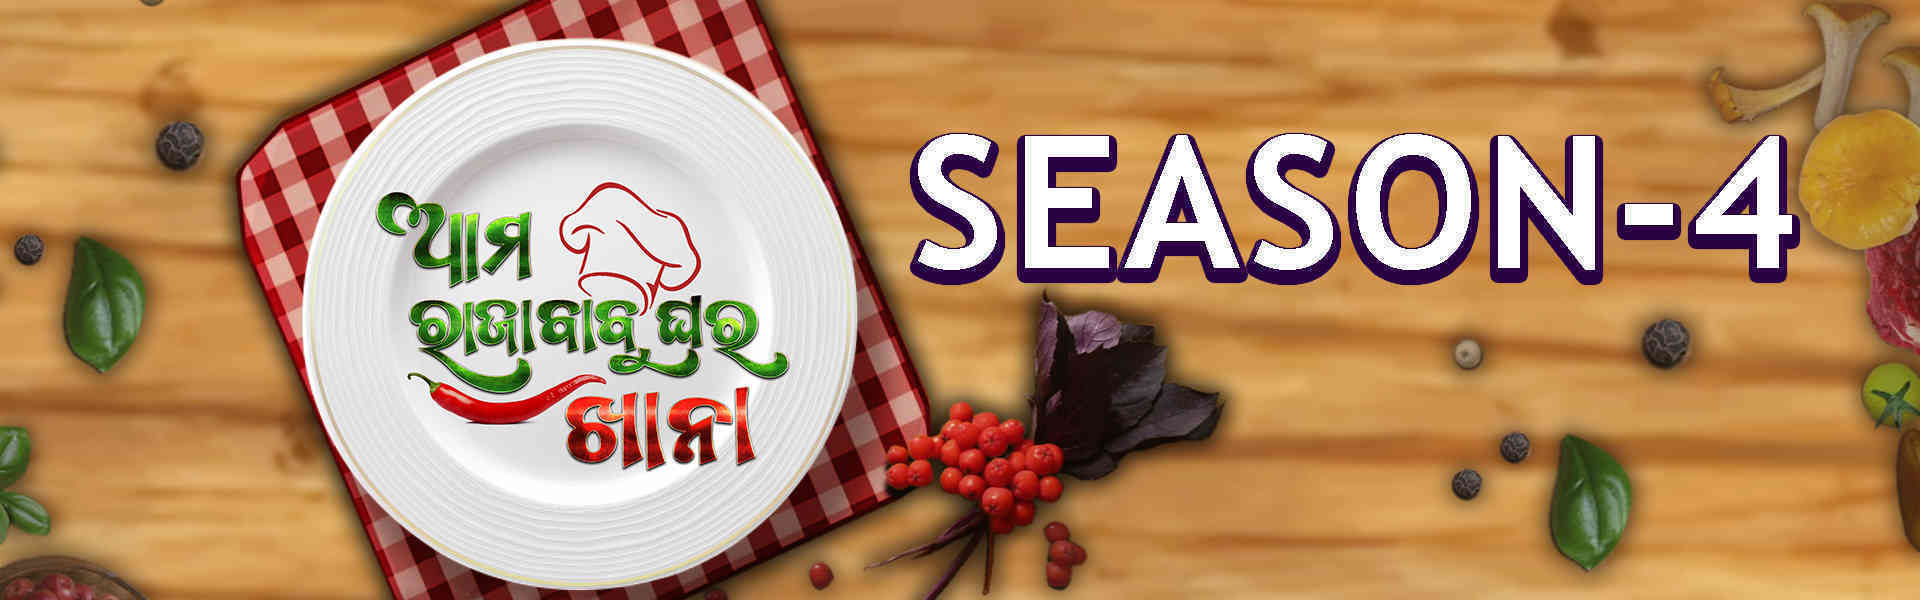 Aama Raja Babu Ghara Khana Season - 4